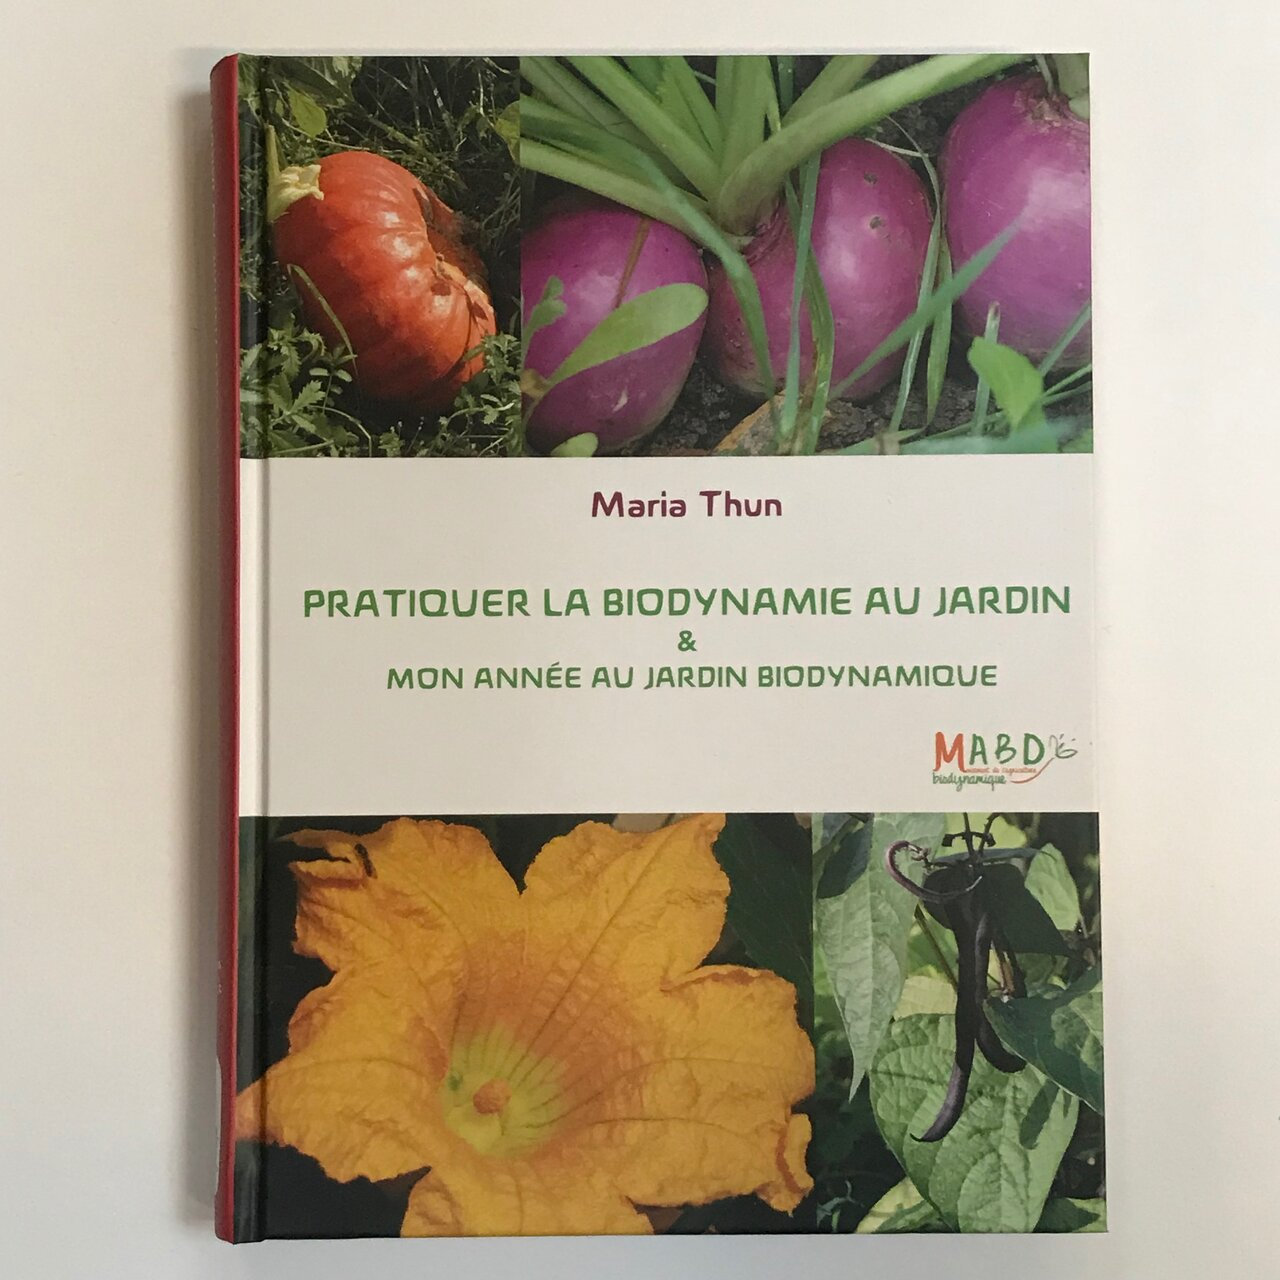 Calendrier Des Semis Biodynamique.Jardinage Pratiquer La Biodynamie Au Jardin Mon Annee Au Jardin Biodynamique